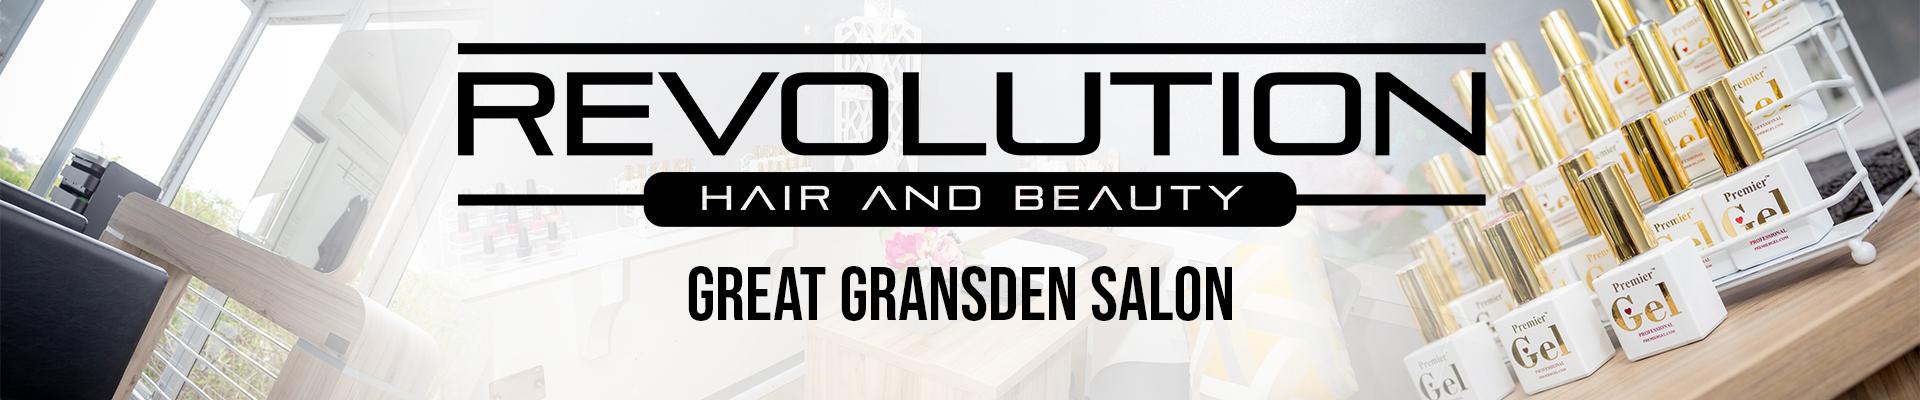 Salon Banner.jpg